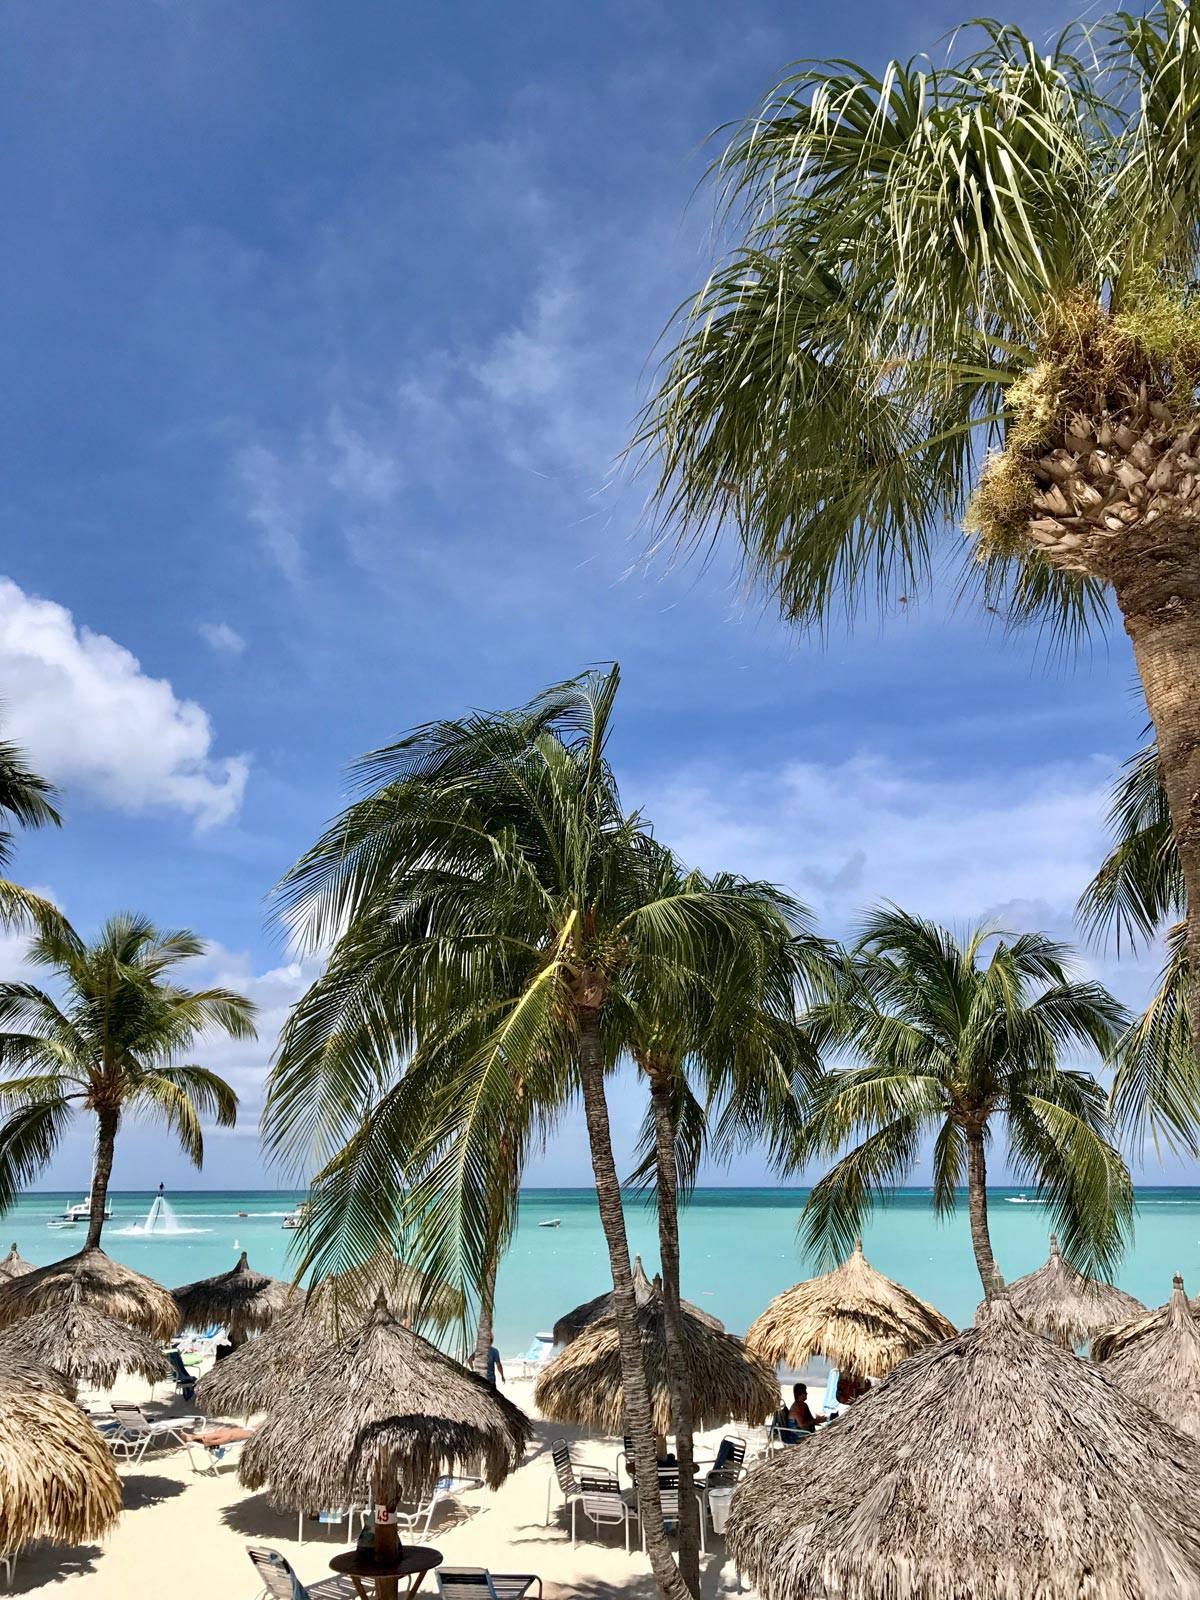 Aruba - Palm Beach - from afarmgirlsdabbles.com